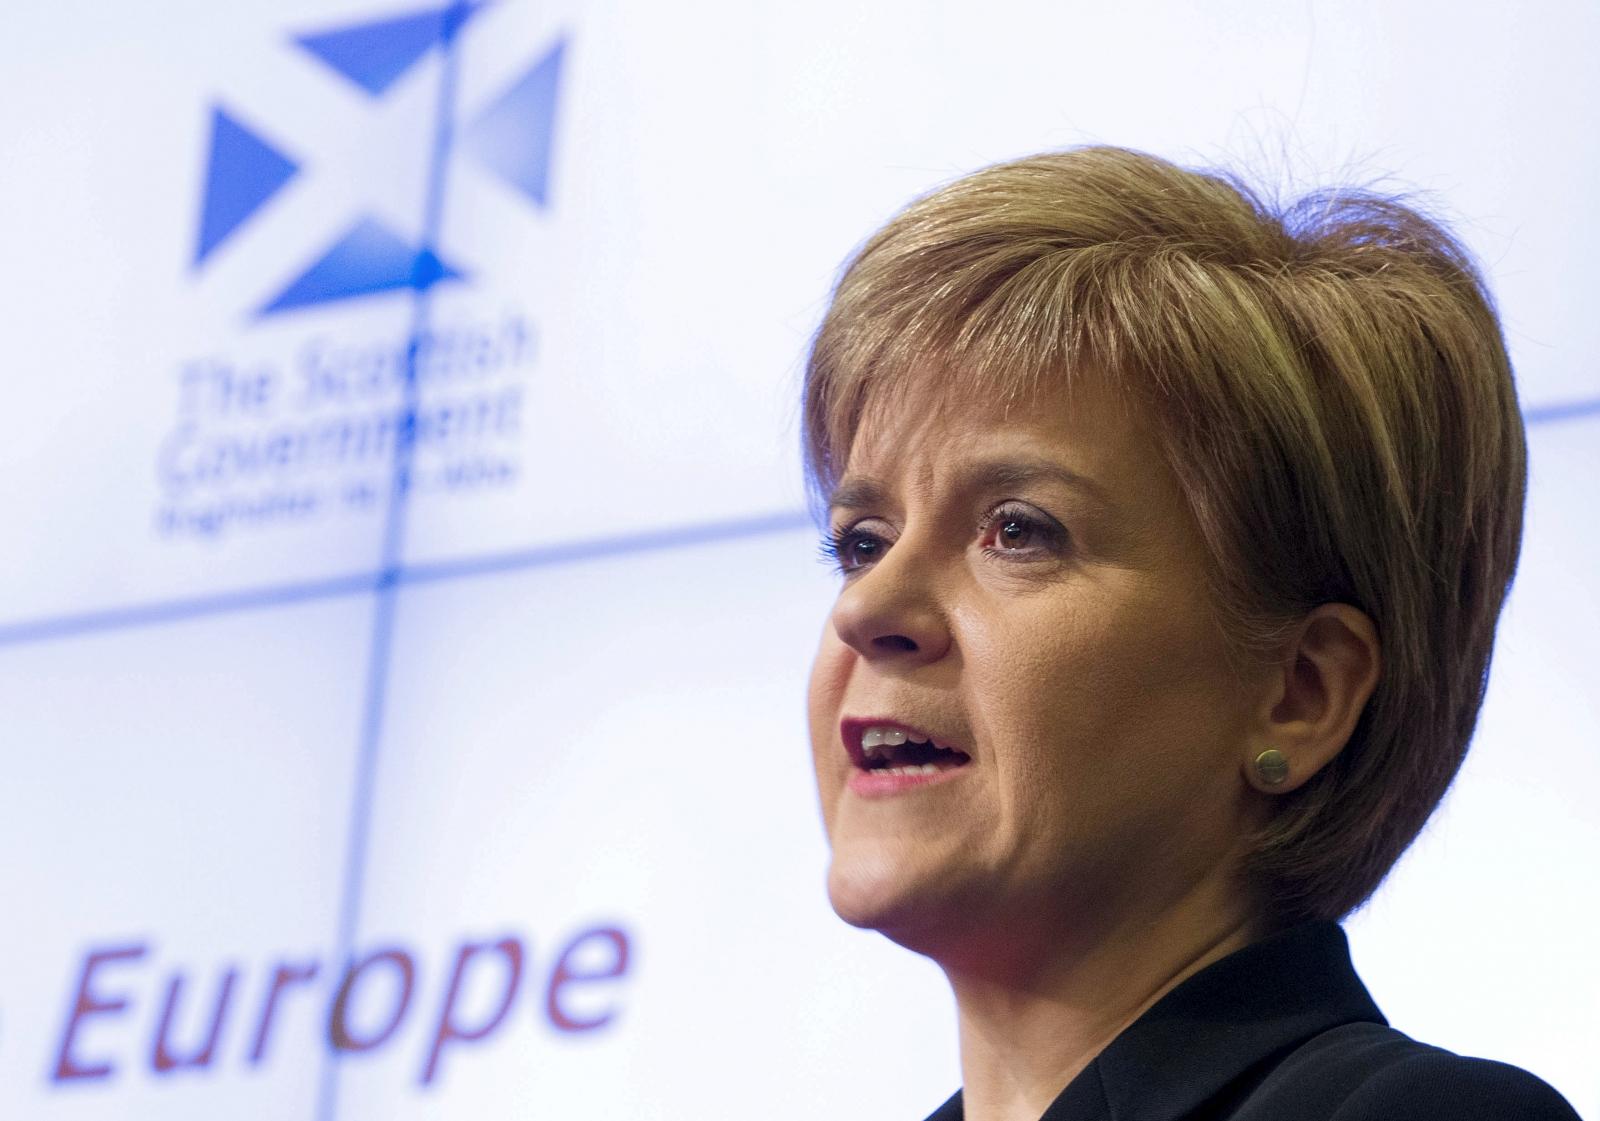 Nicola Sturgeon at the European Policy Centre